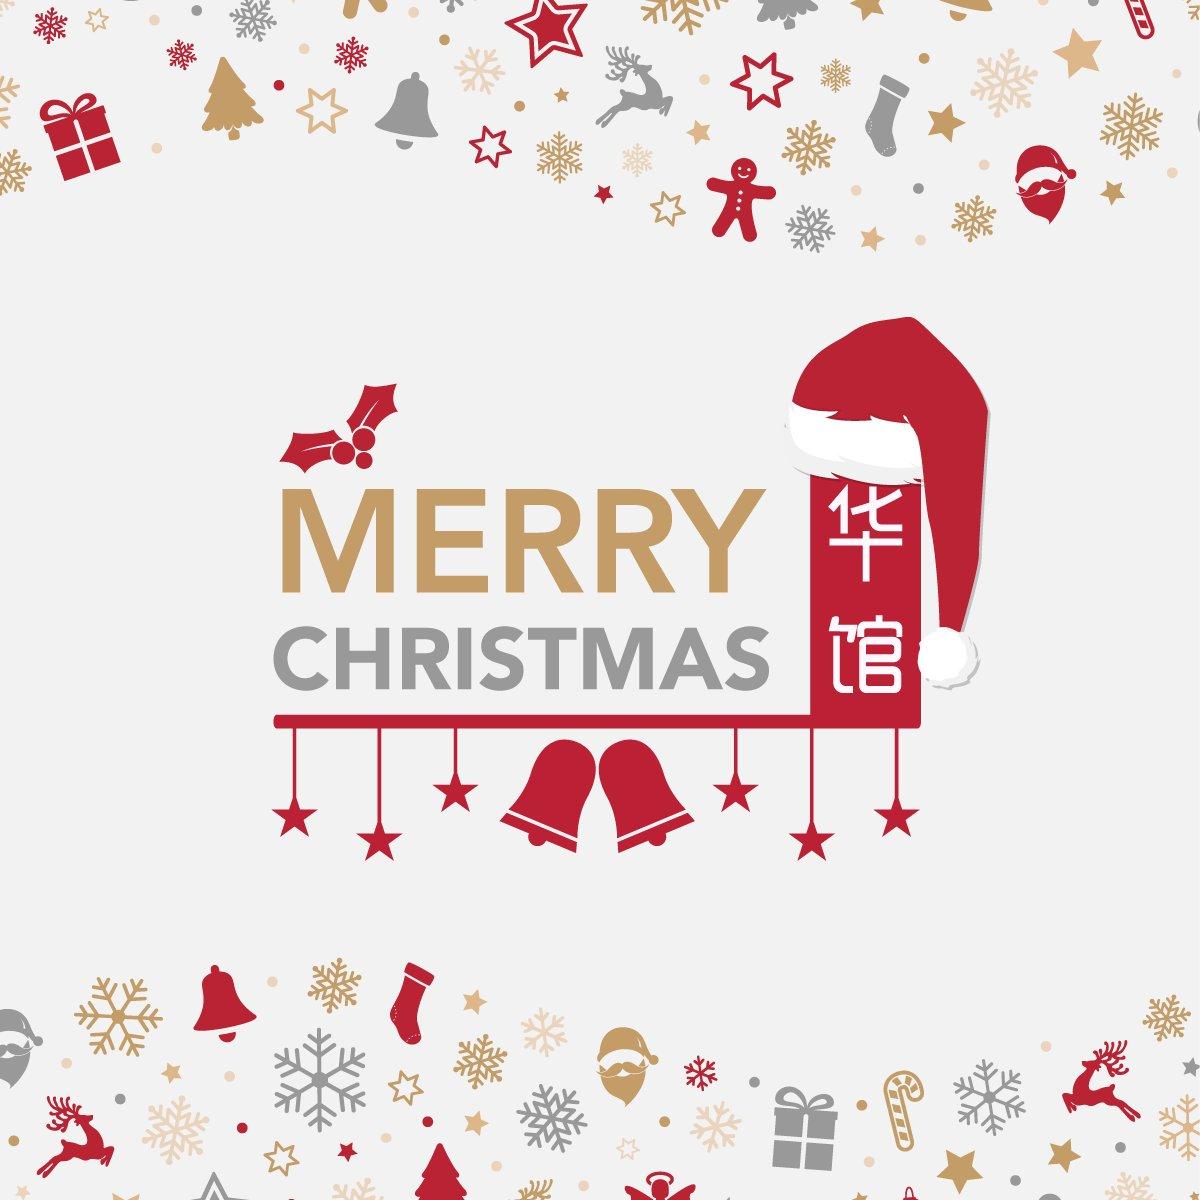 We wish you joy, love, and hope during this Christmas season. #PFChangsLebanon #MerryChristmas #Joy #Love #Hope #Christmas #25December https://t.co/2dYvmtu9Rr